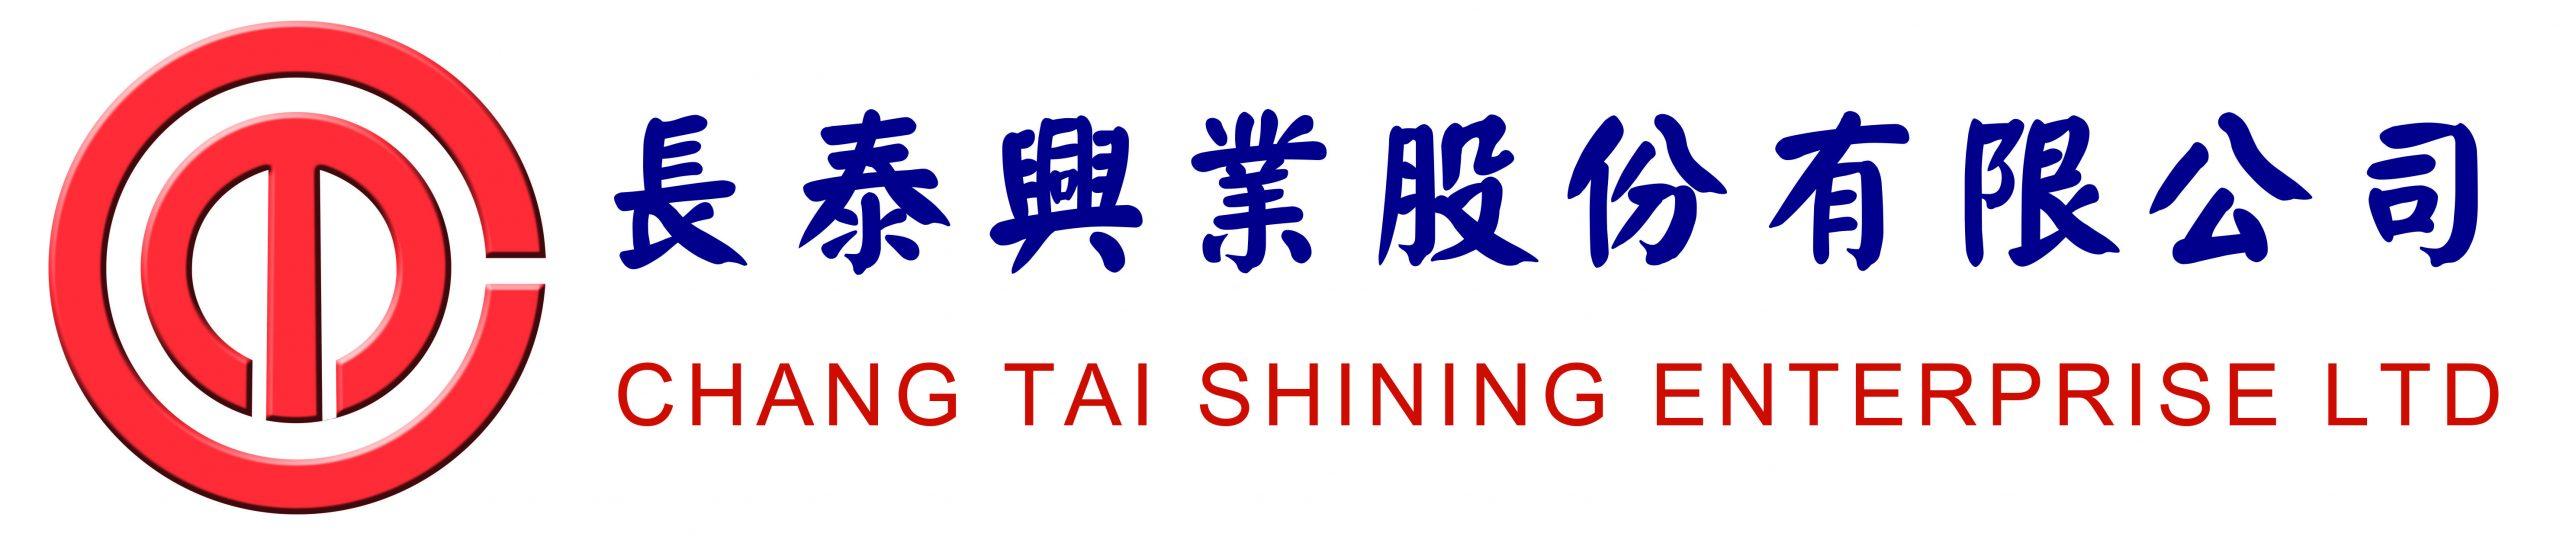 長泰興新網站 CHANG TAI SHINING ENTERPRISE LTD